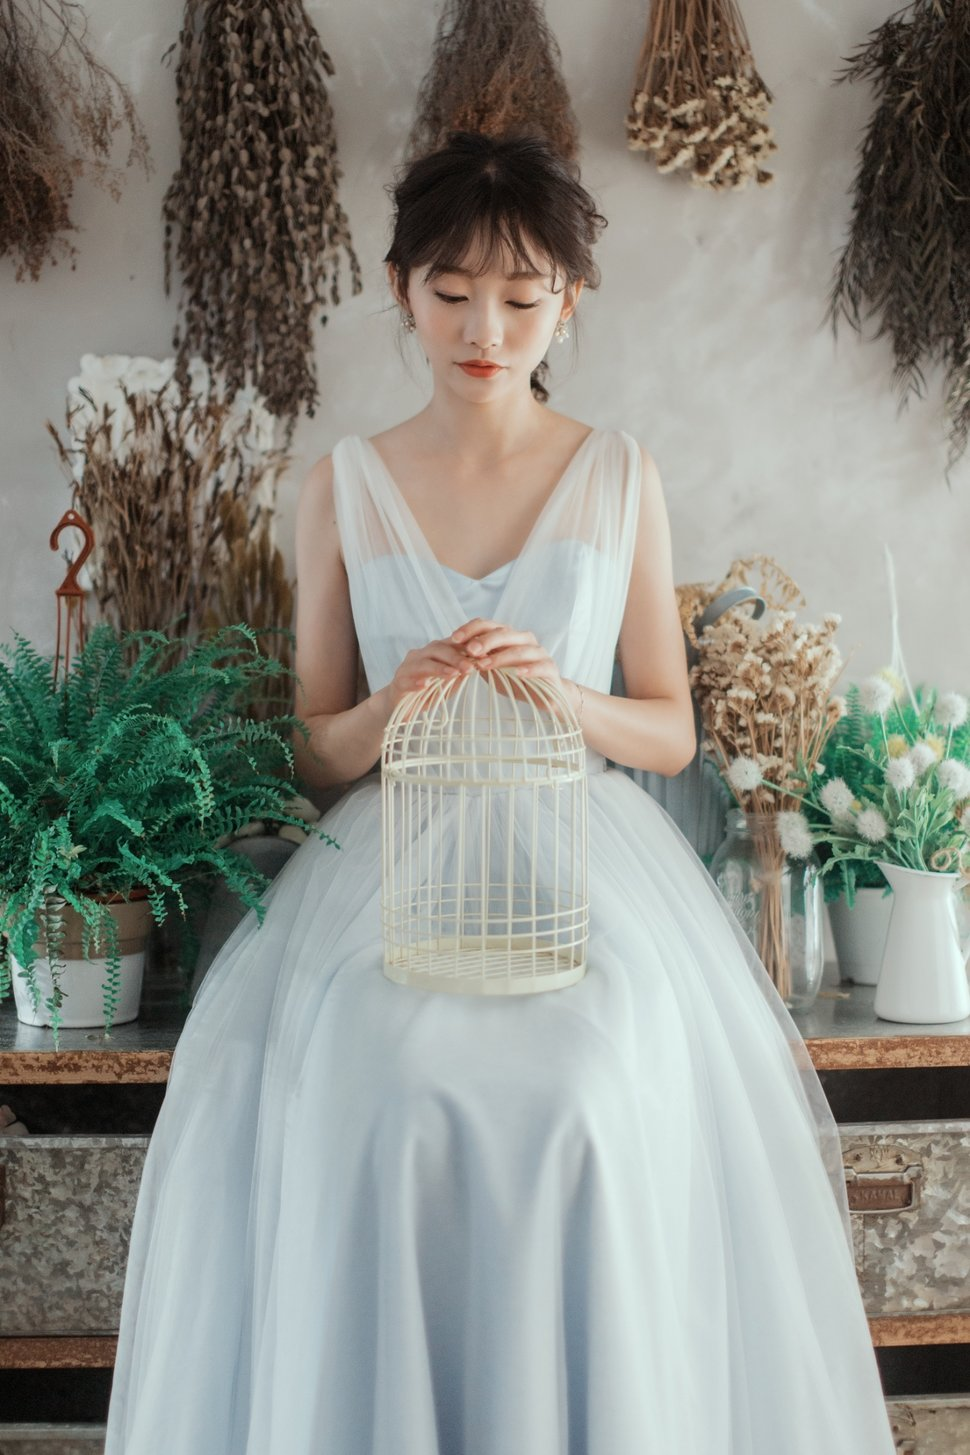 20180902_181121_0015 - Zona時尚美甲x新娘秘書整體造型工作室《結婚吧》